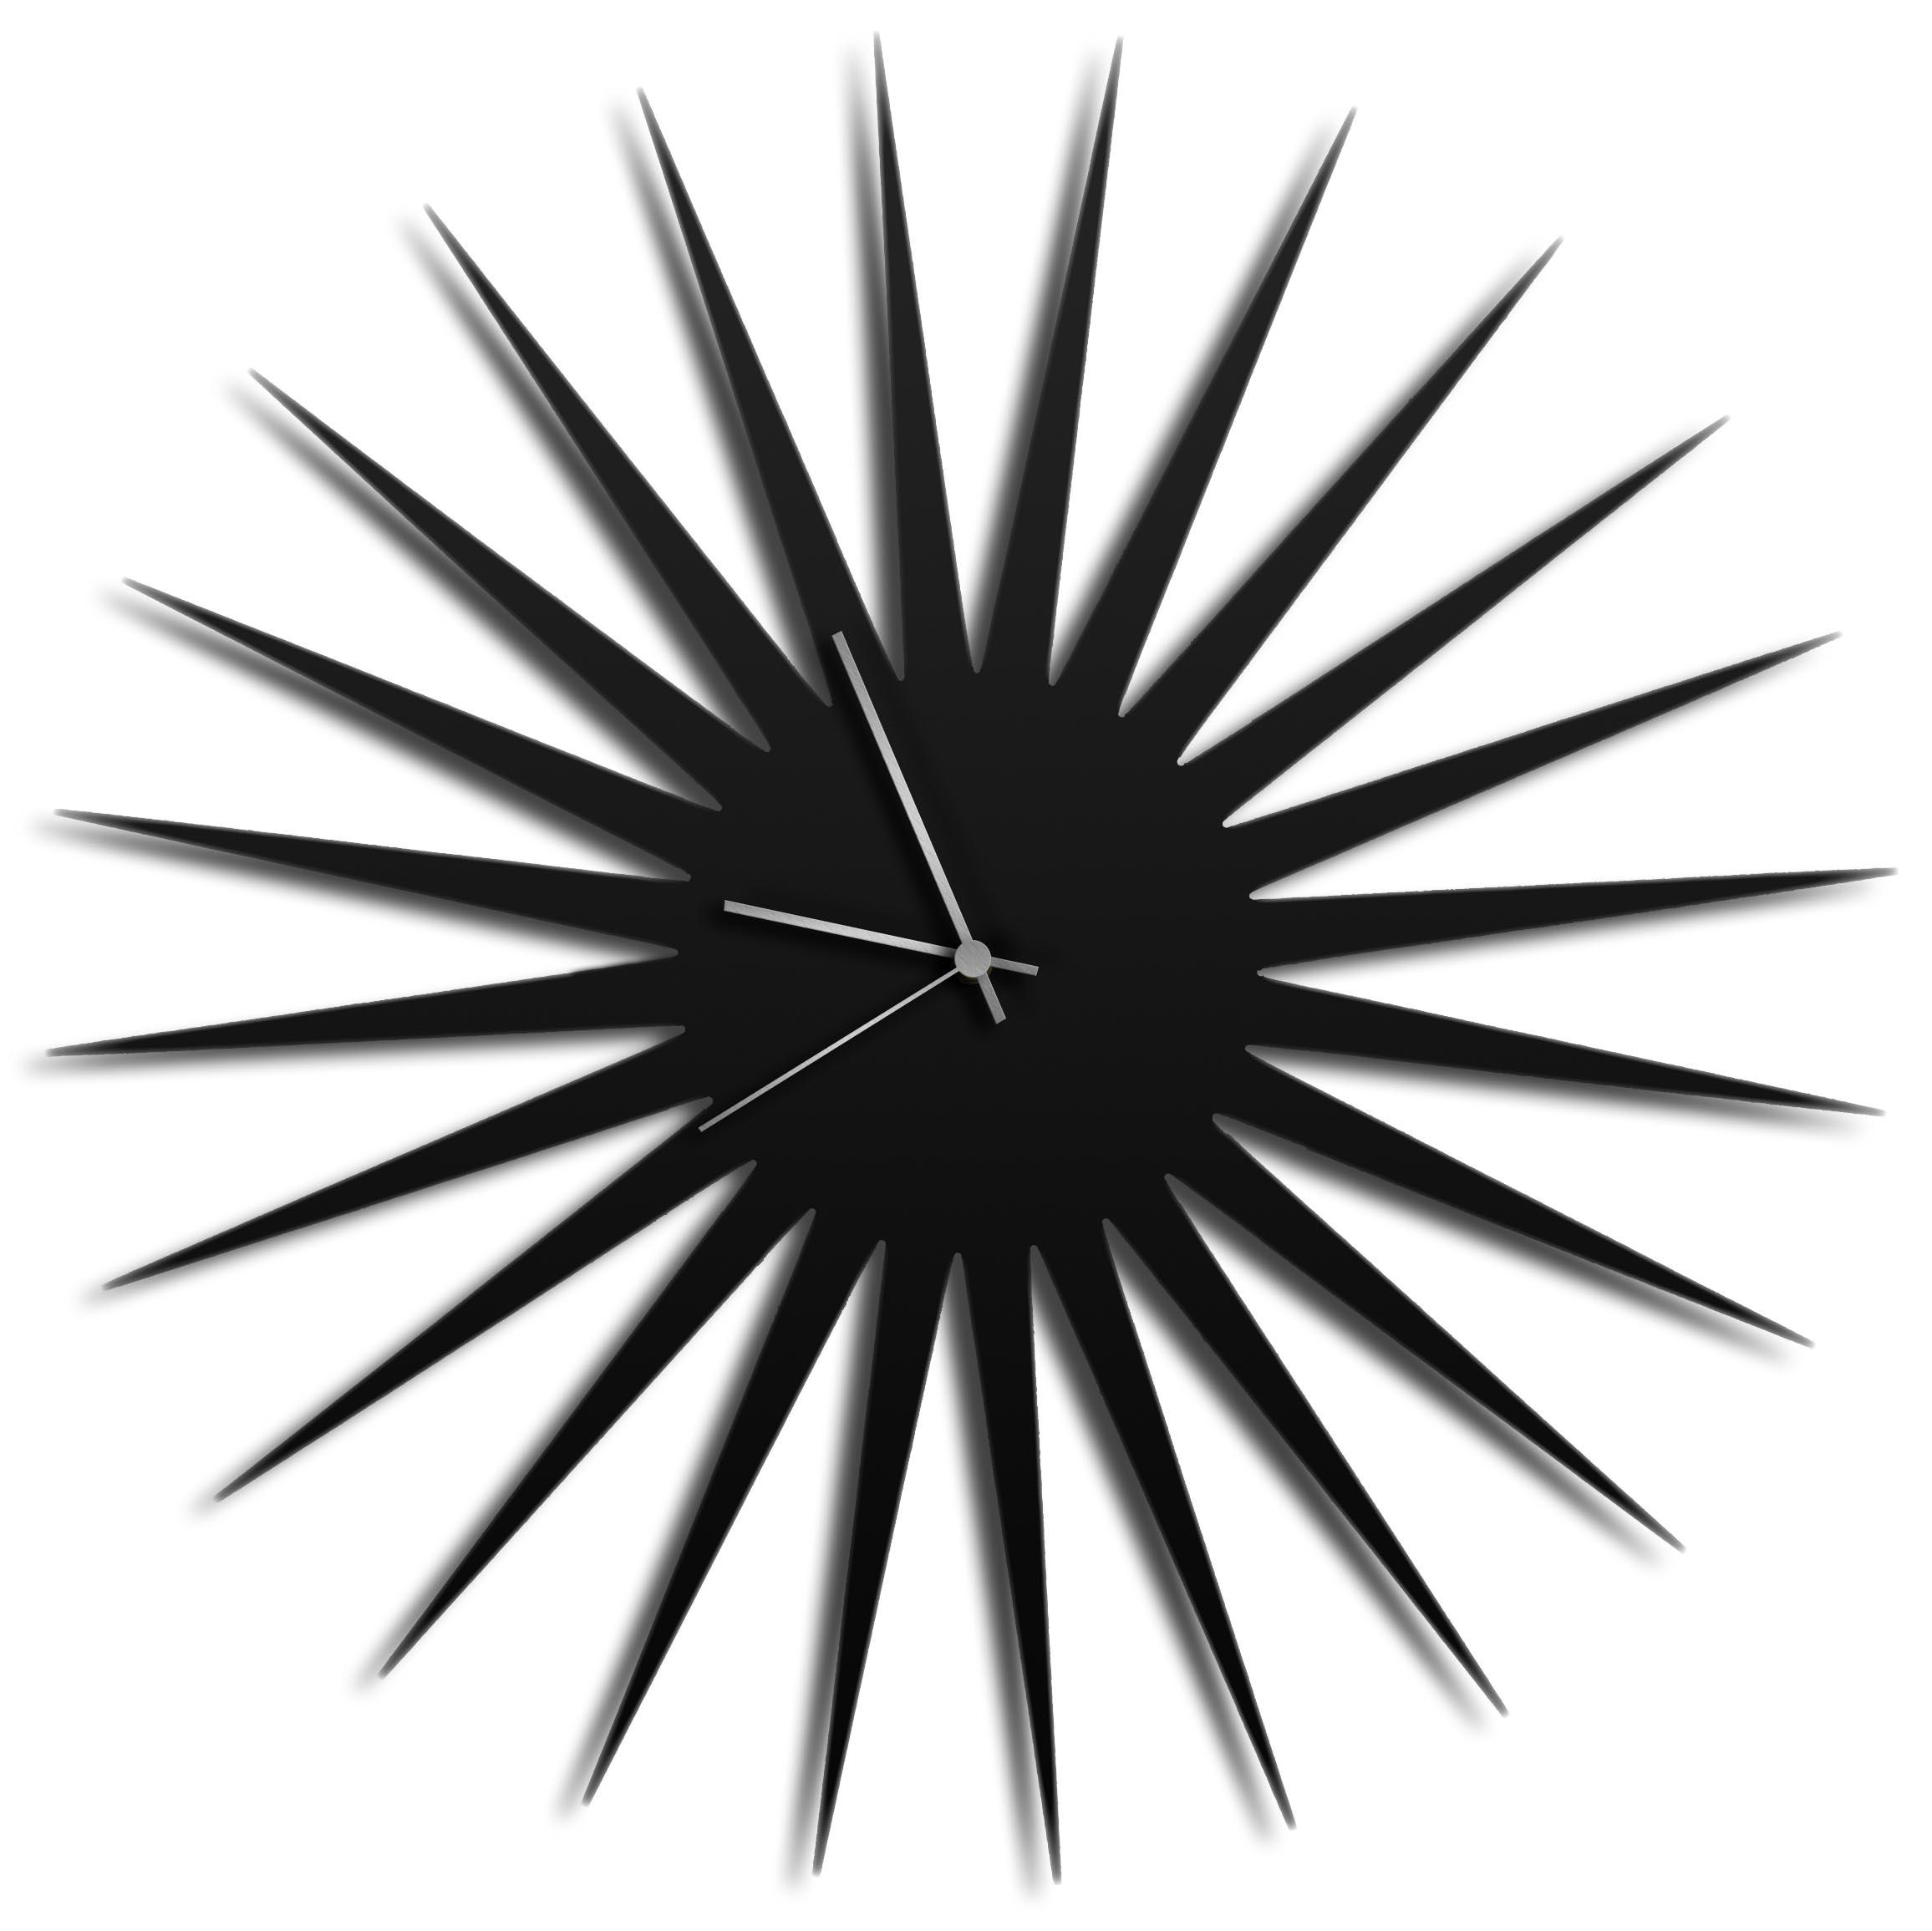 Adam Schwoeppe 'MCM Starburst Clock Black Silver' Midcentury Modern Style Wall Clock